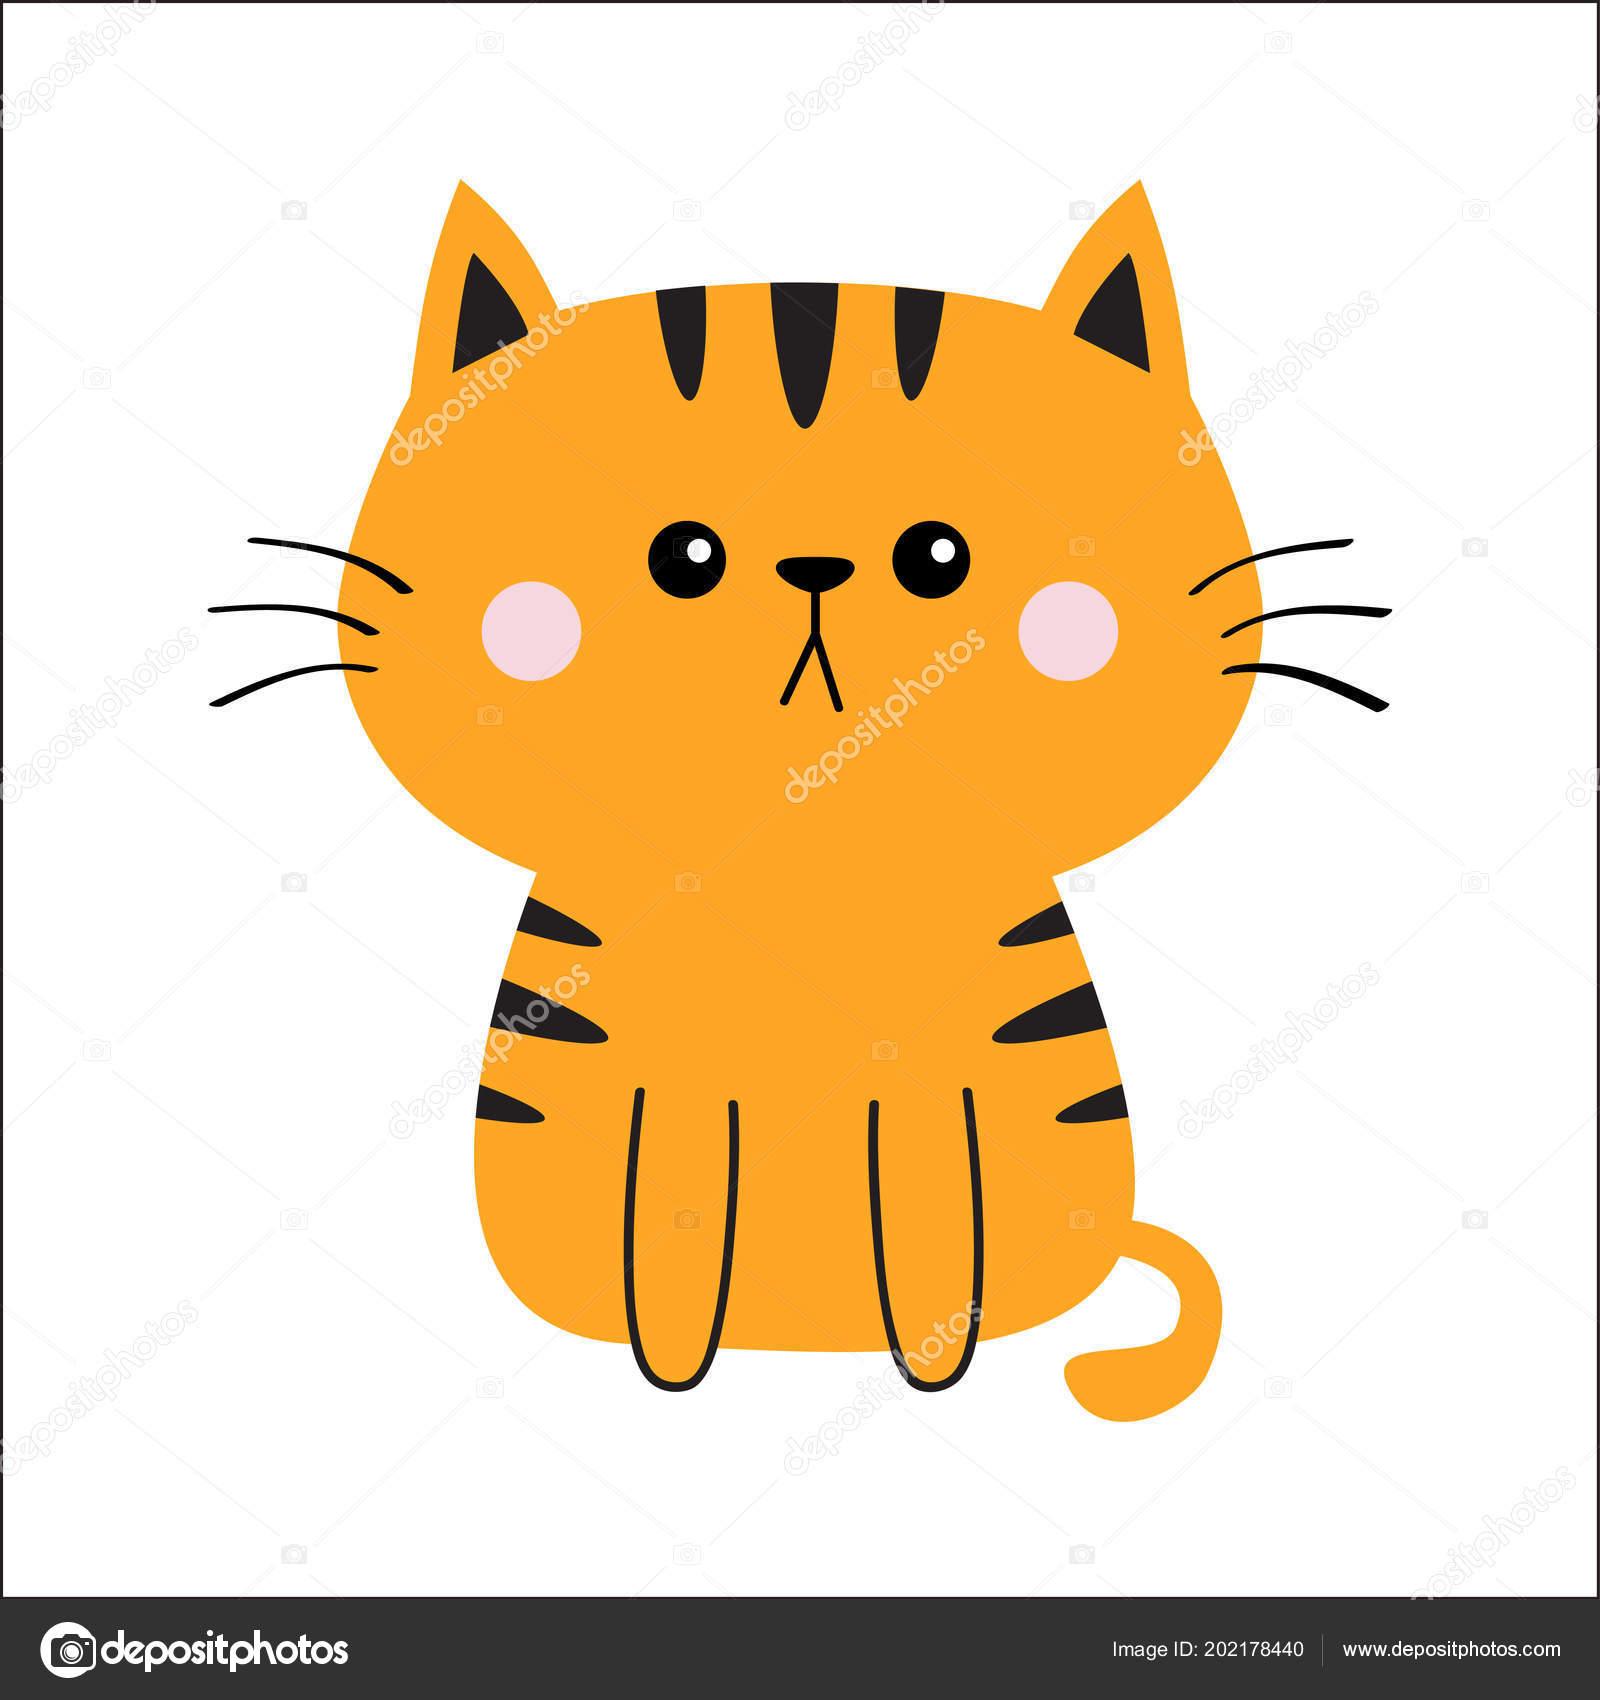 Silueta Cara Triste Cabeza Gato Color Naranja Rojo Dibujos Animados